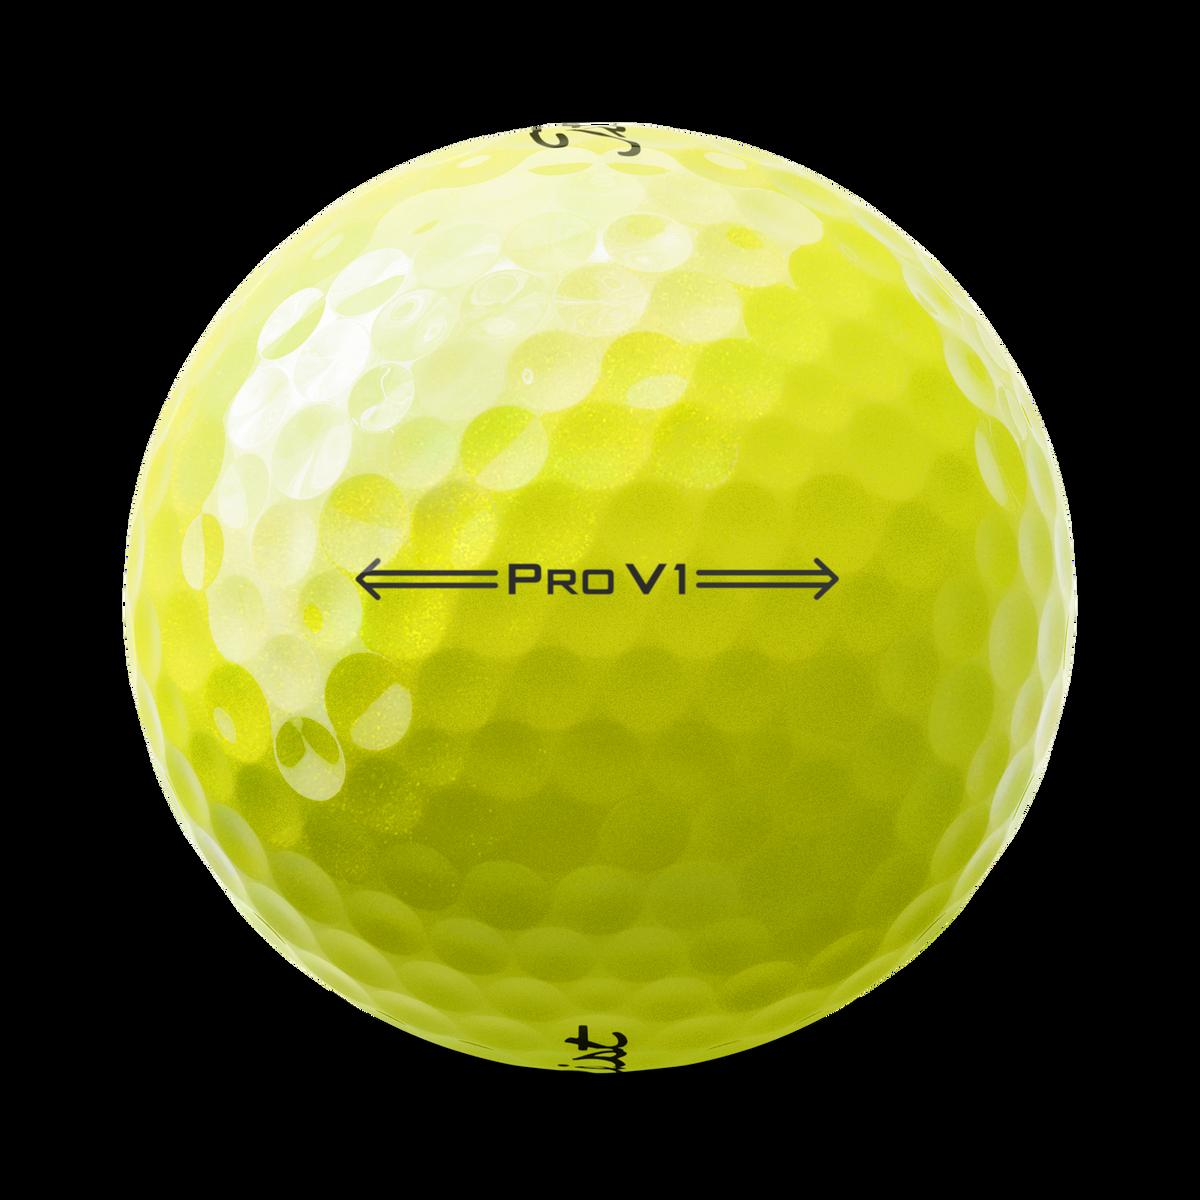 Pro V1 Yellow